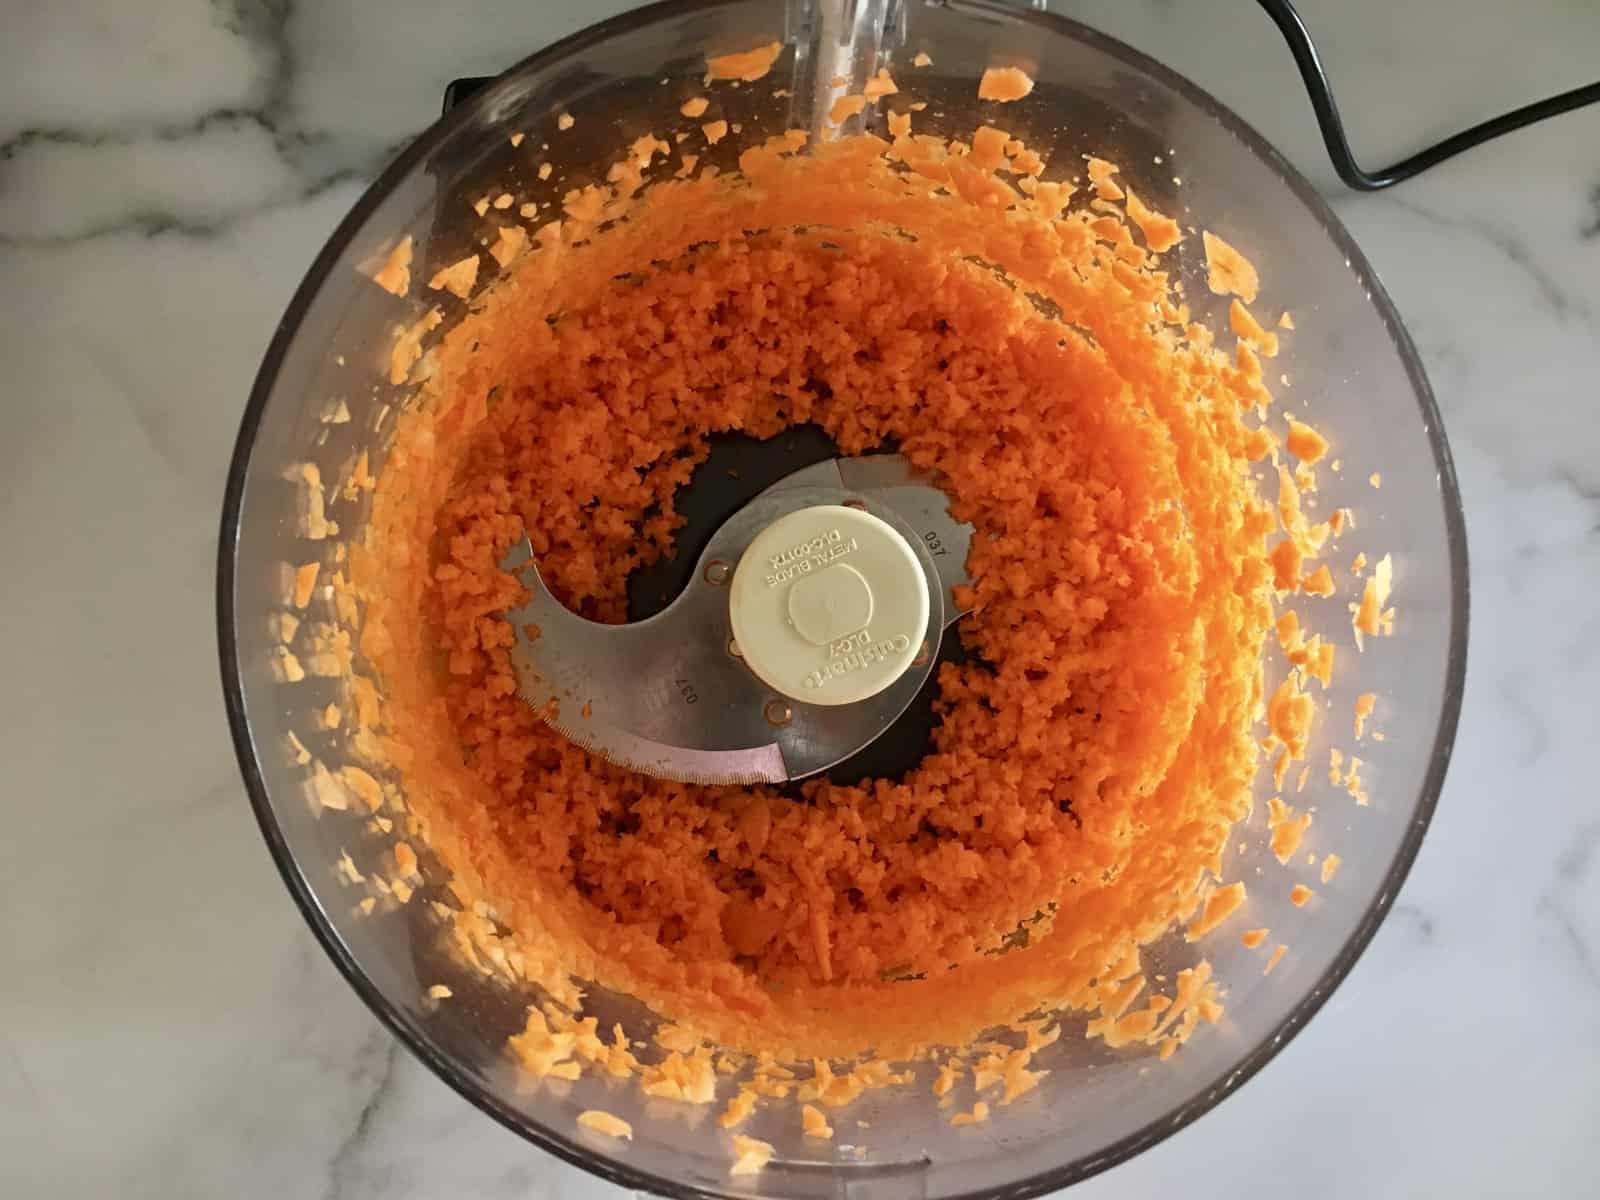 shredded carrot in a food processor